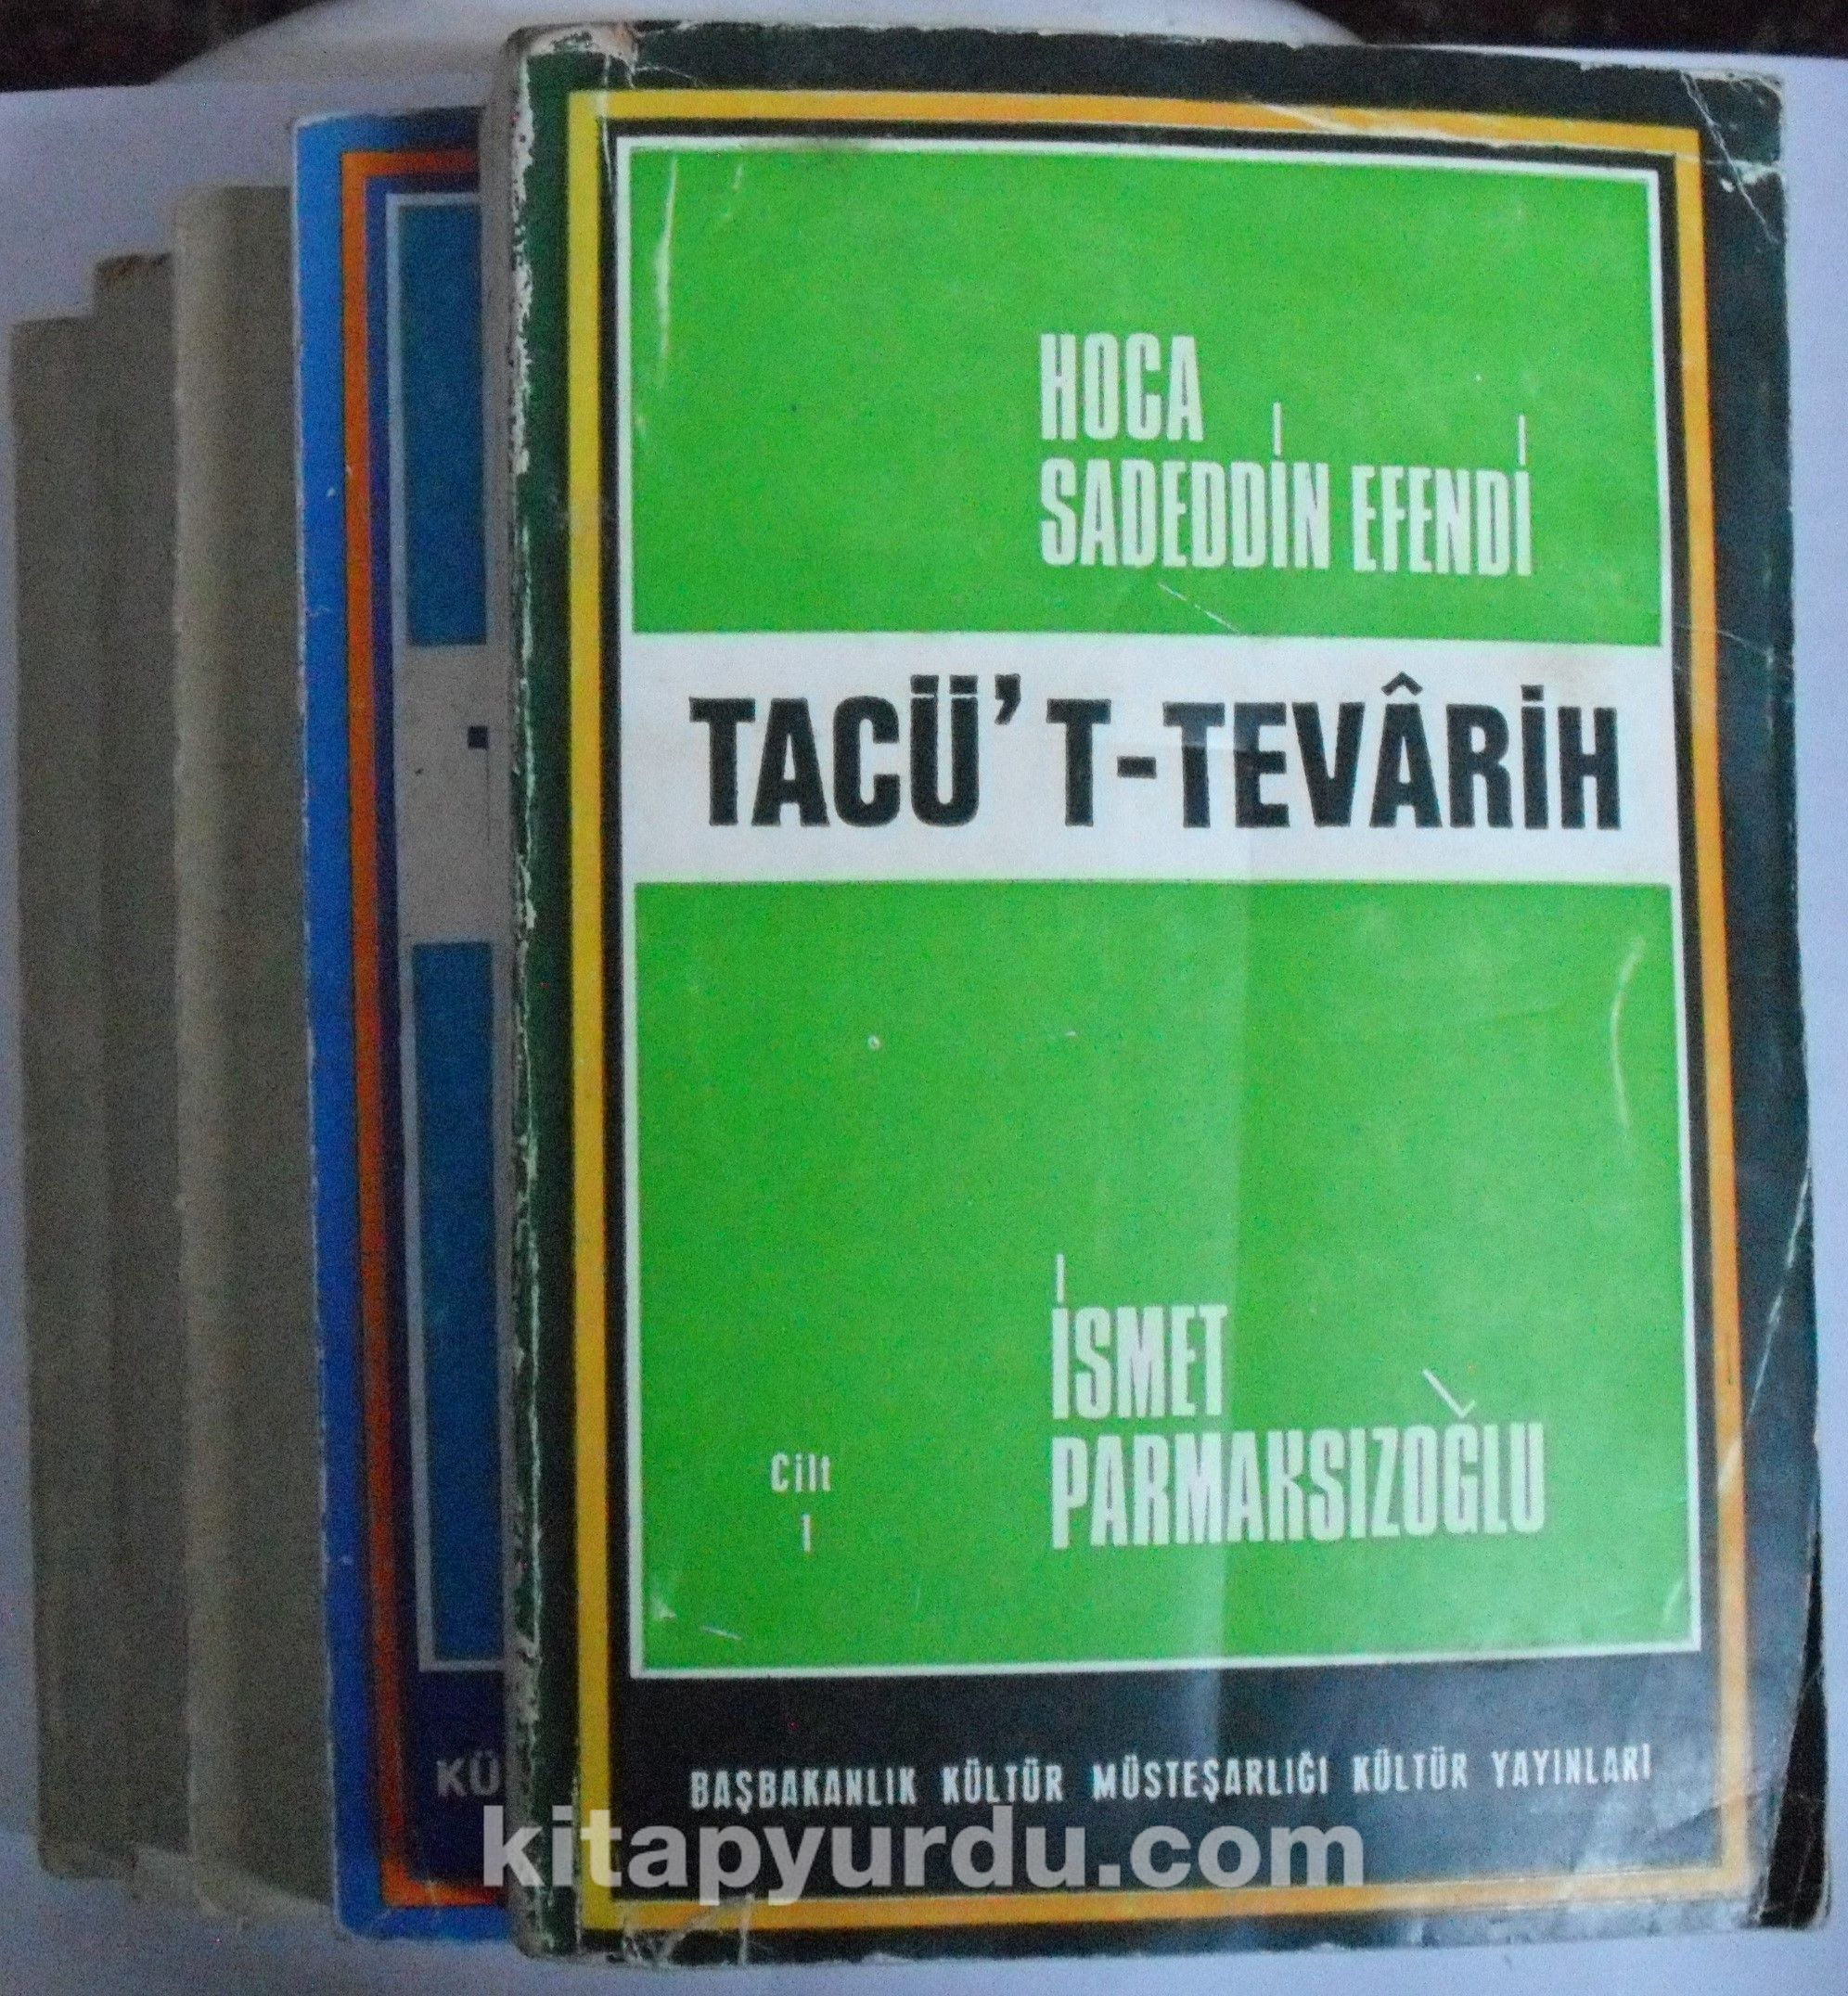 Tacü't-Tevarih (5 Cilt Takım) Kod:6-G-38